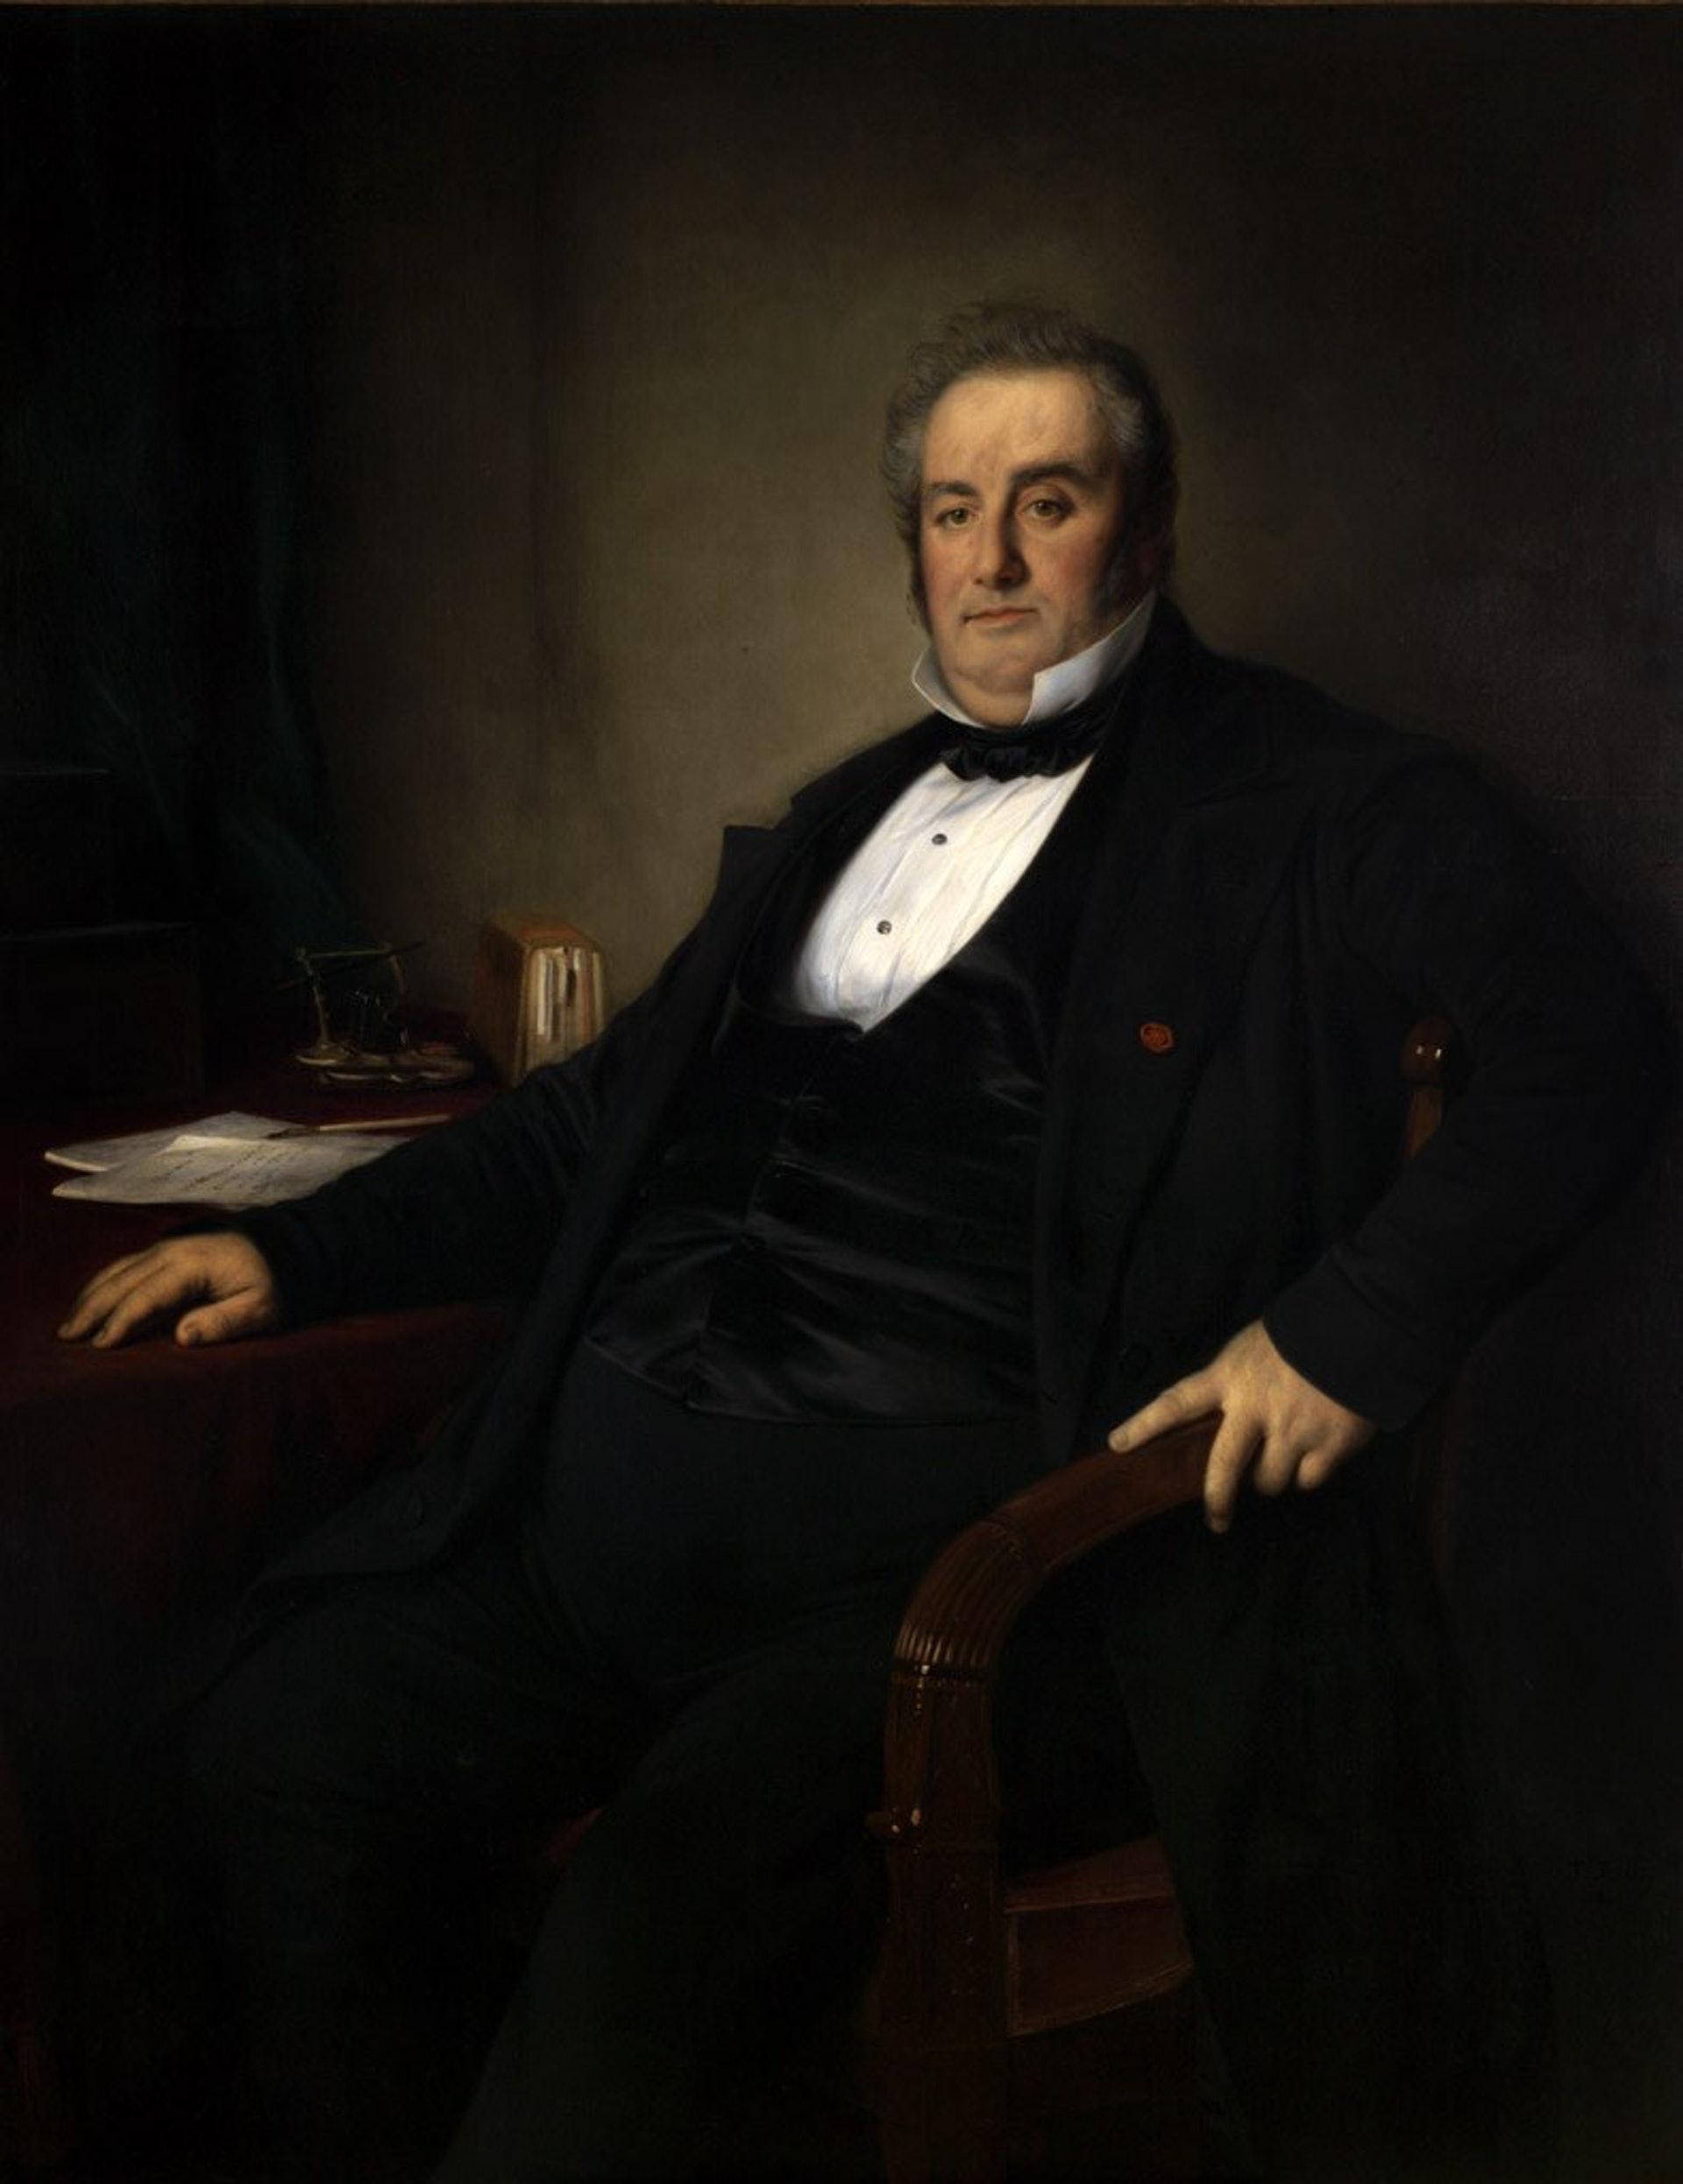 Lodi-Martin Duffour-Dubergier除了是Bordeaux Wine Council的主席,也曾是波爾多的市長(圖片來源:Wiki)